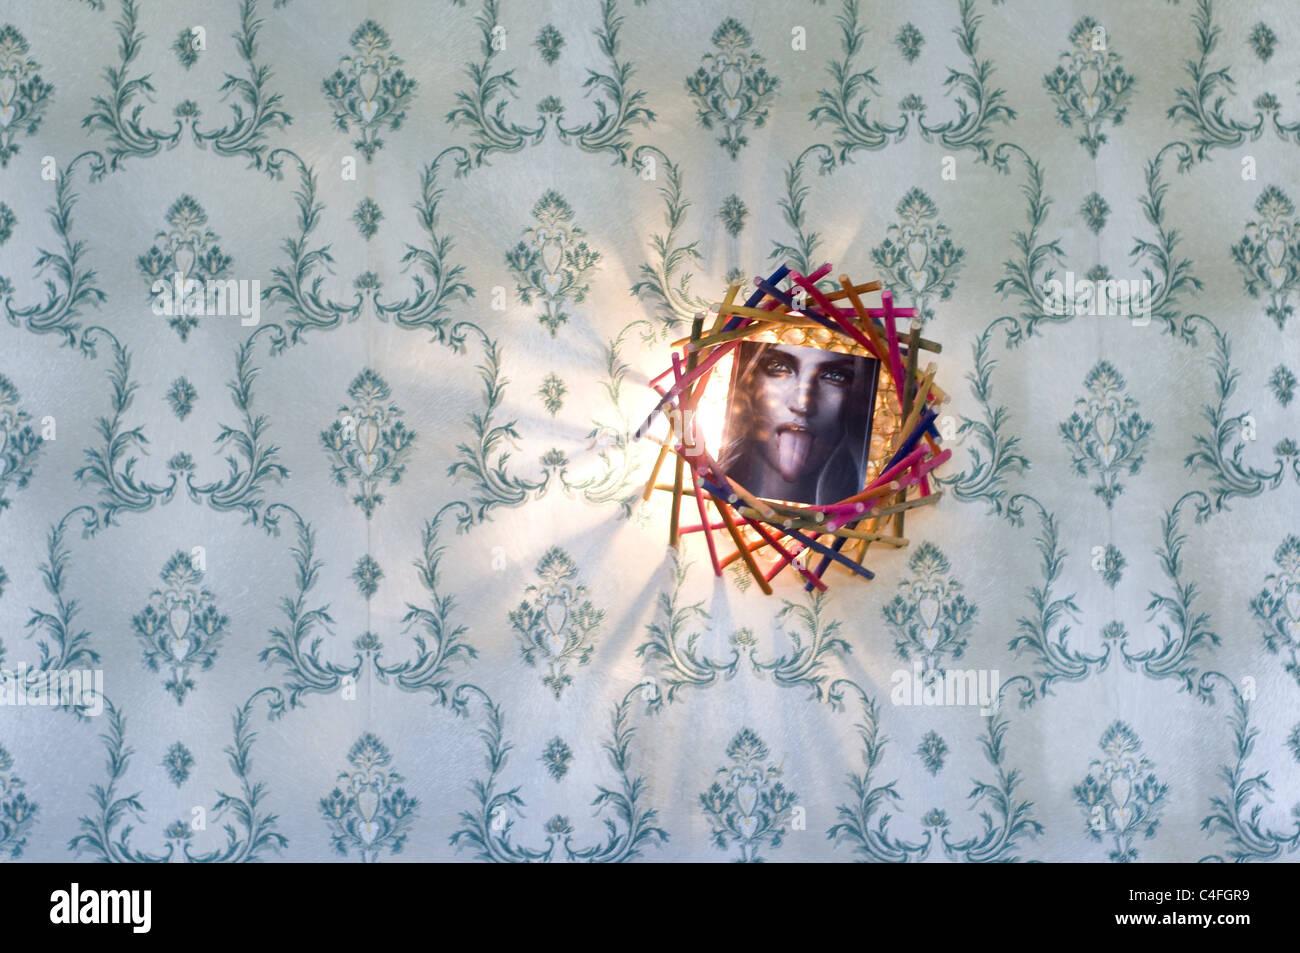 Bilderrahmen auf Tapete Stockfoto, Bild: 37221837 - Alamy